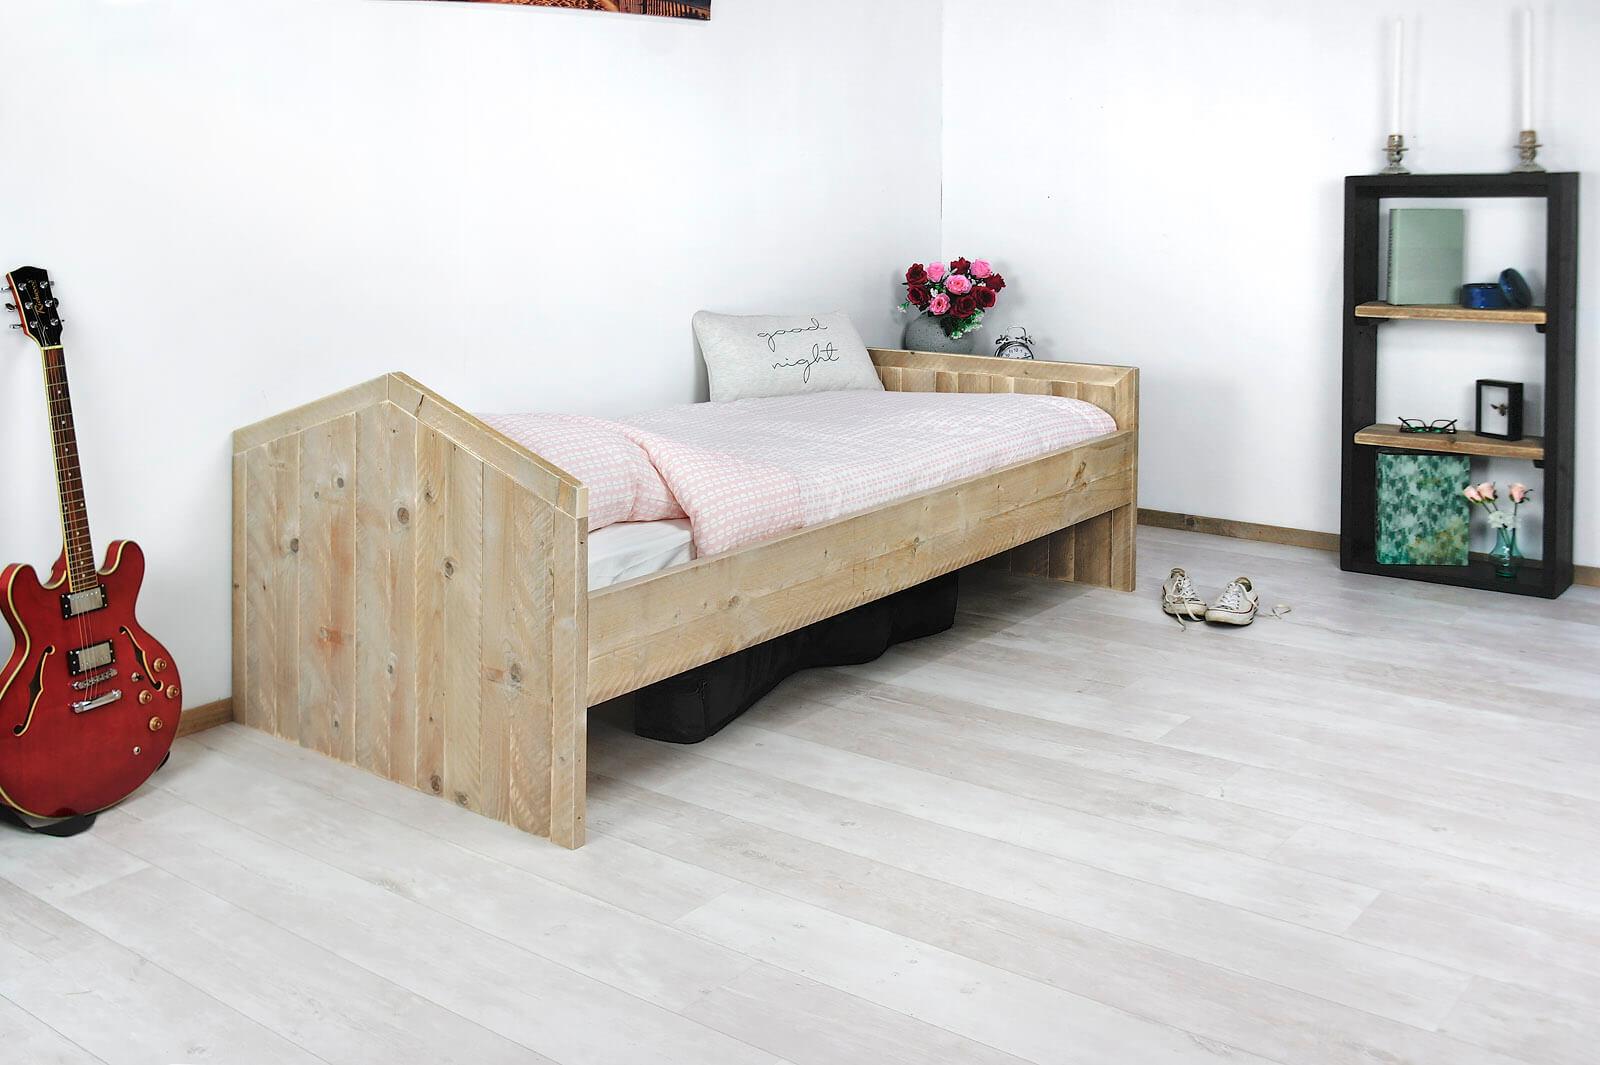 Stoere Steigerhouten Stapelbed.Steigerhouten Bed Coolin Met Stoer Hoofdbord Kopen Bestel Online